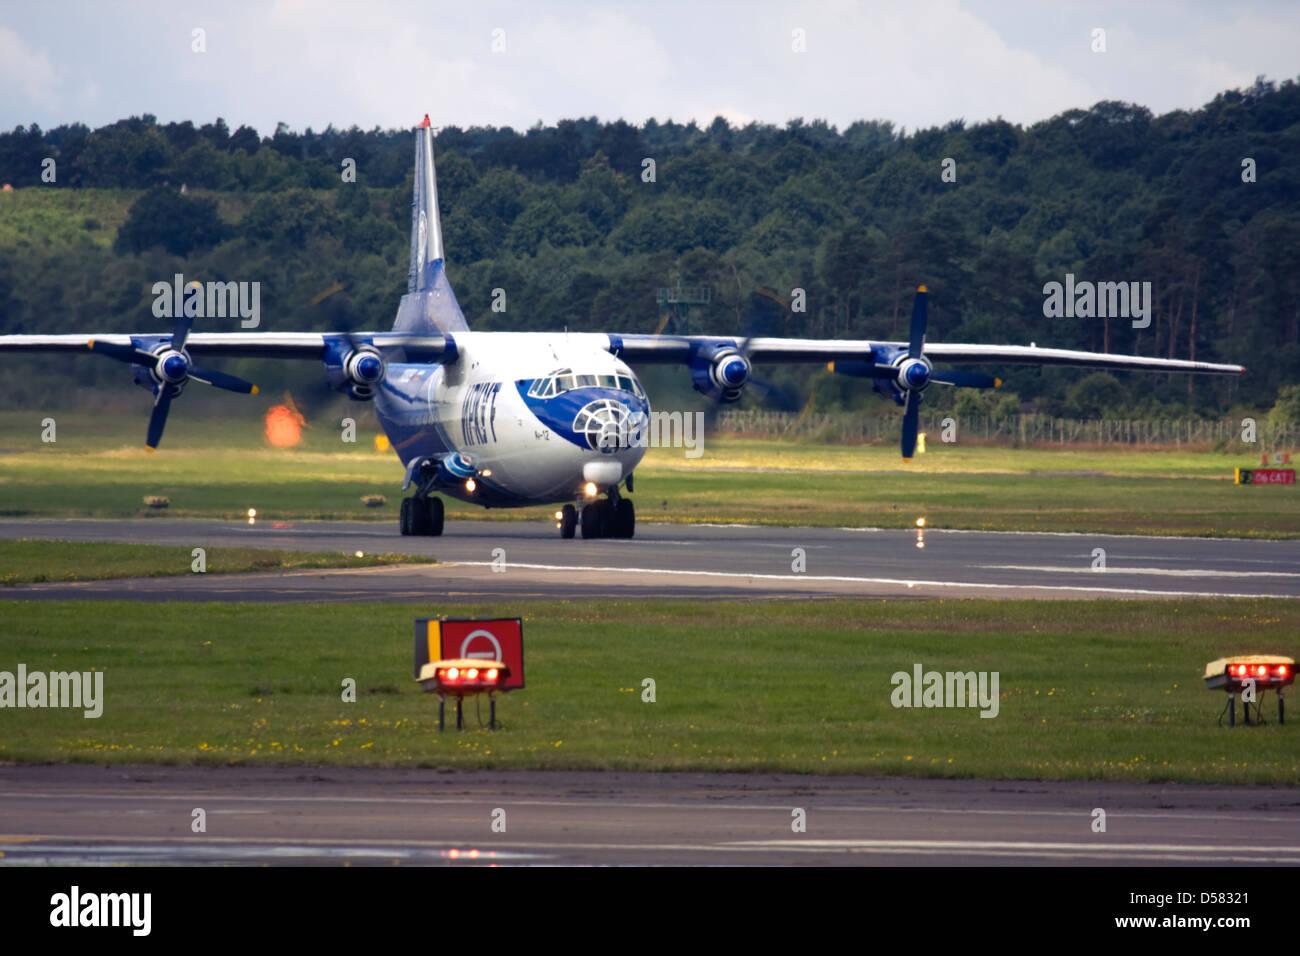 Gromov Air (Irkut-Avia) Antonov An-12 on runway at Farnborough International Airshow 2012 - Stock Image